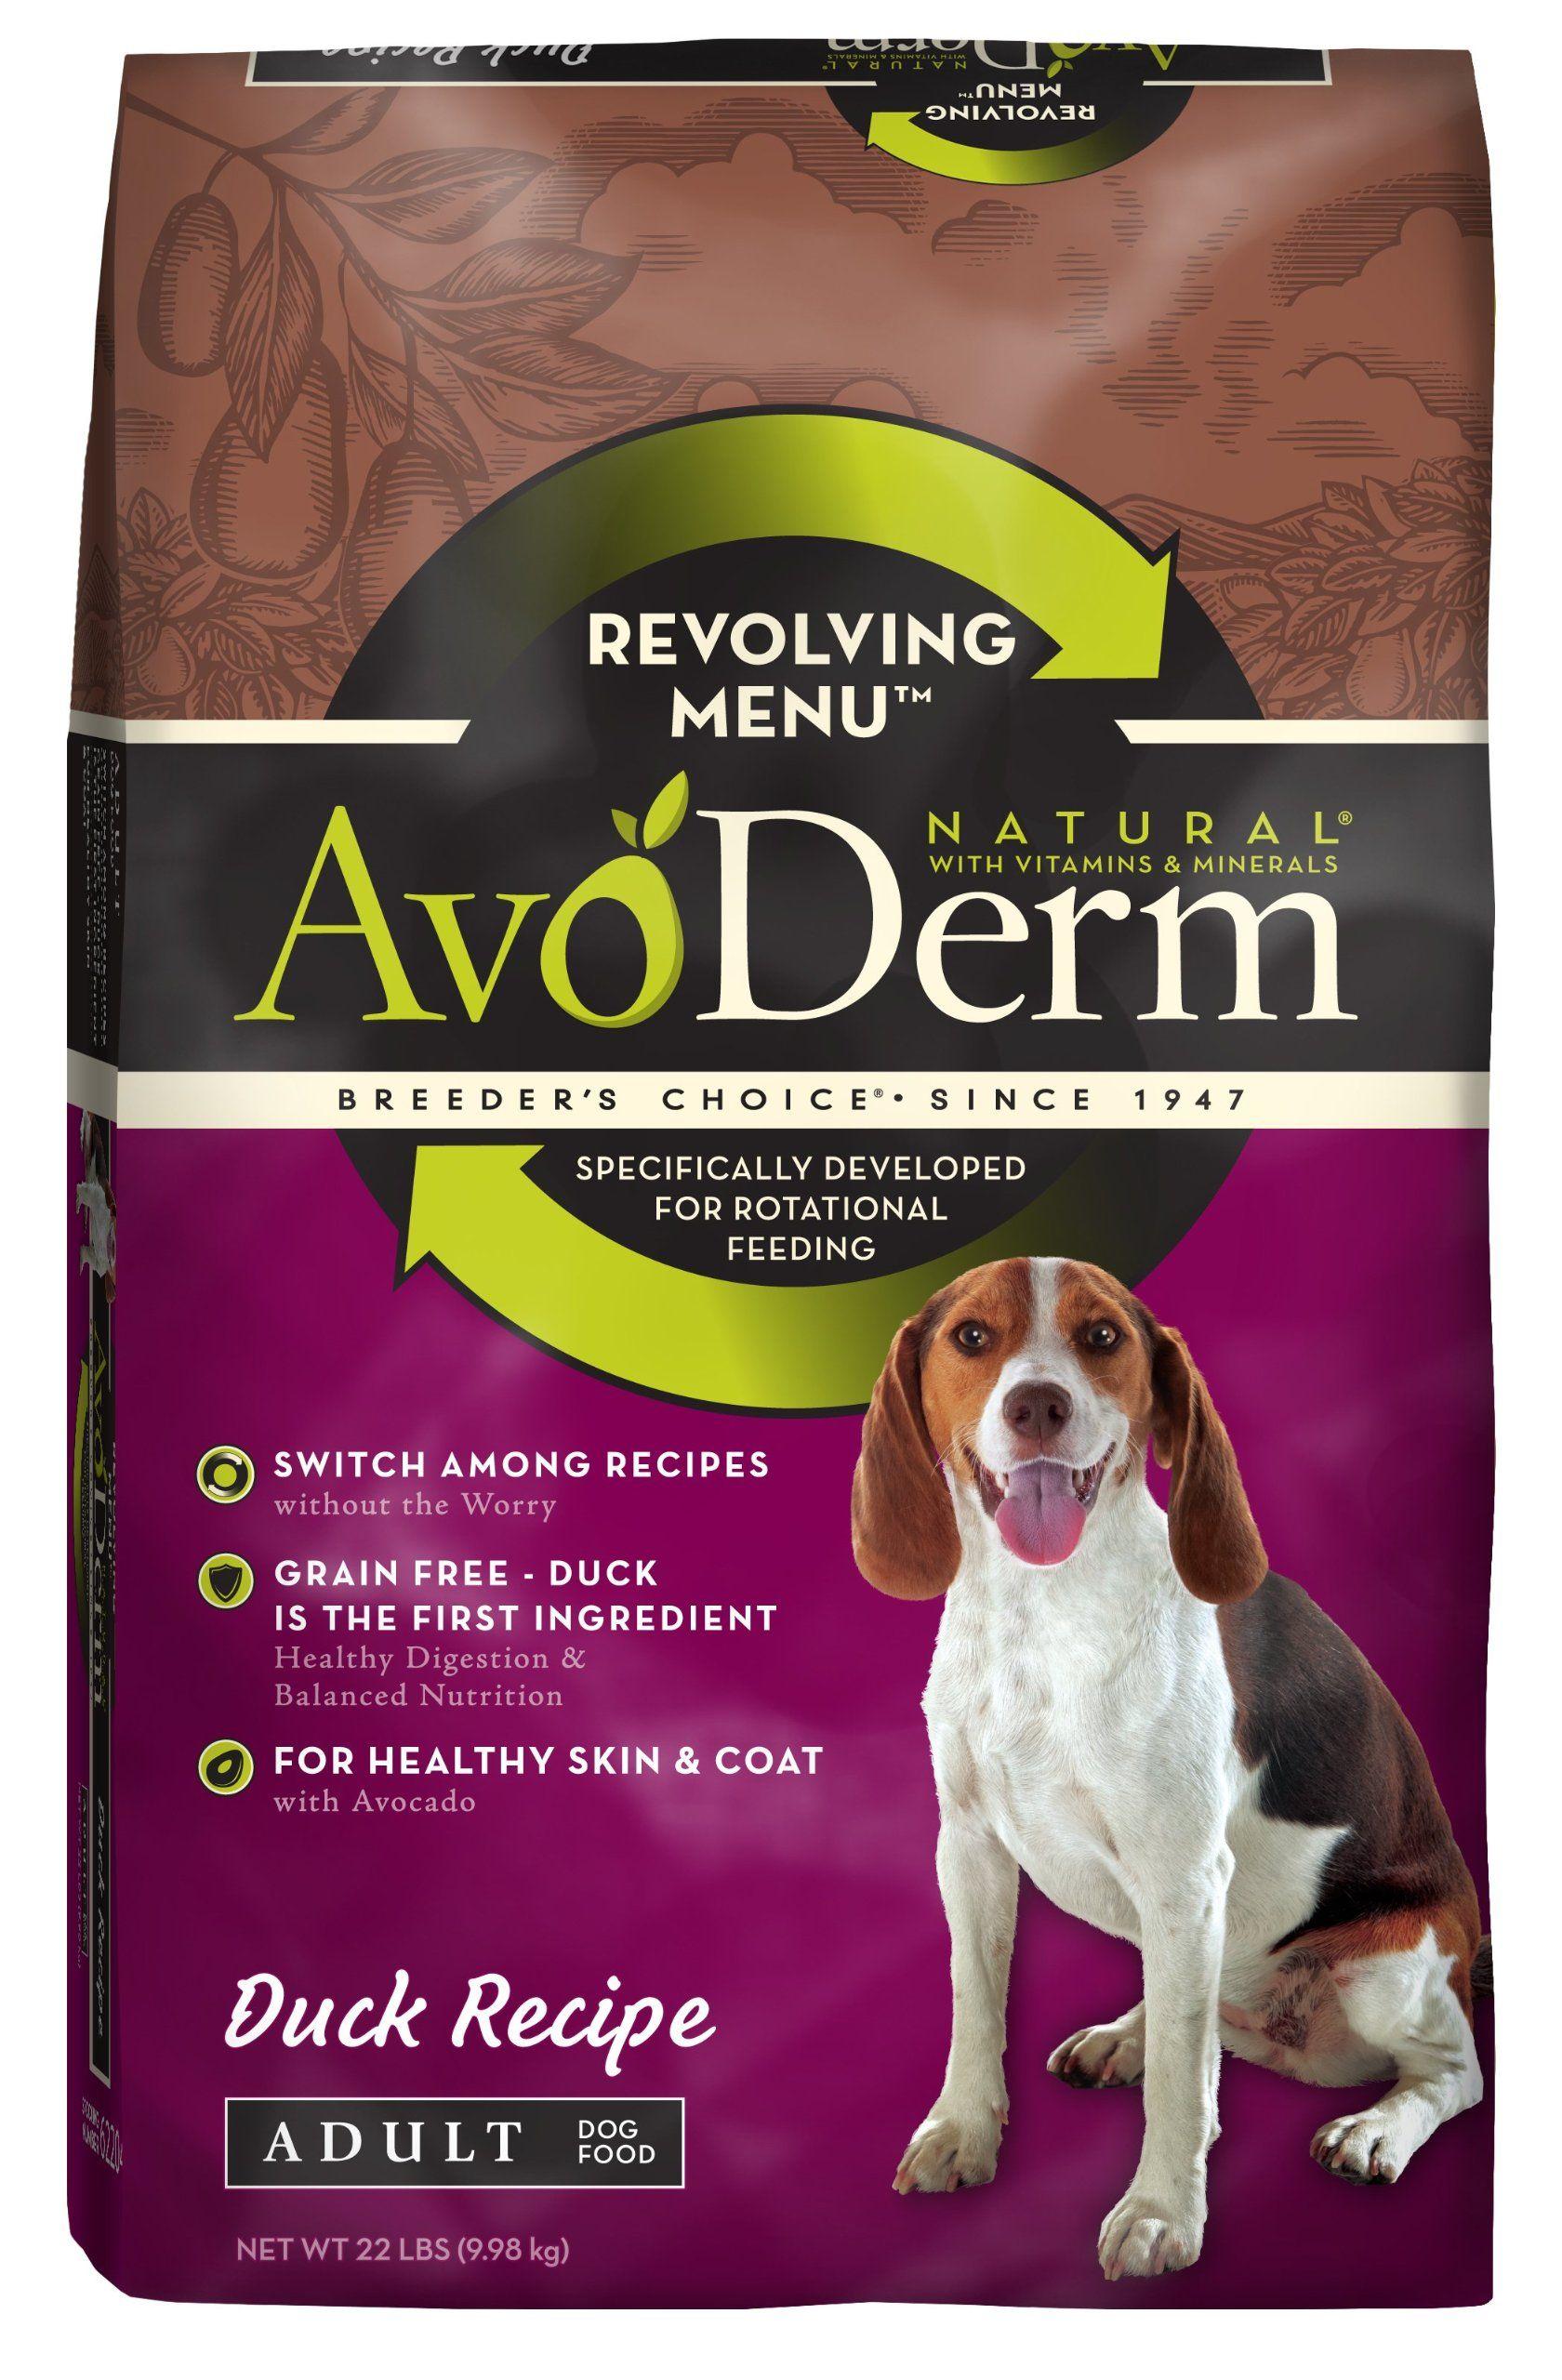 Avoderm Natural Revolving Menu Adult Dog Food Duck 22 Pound